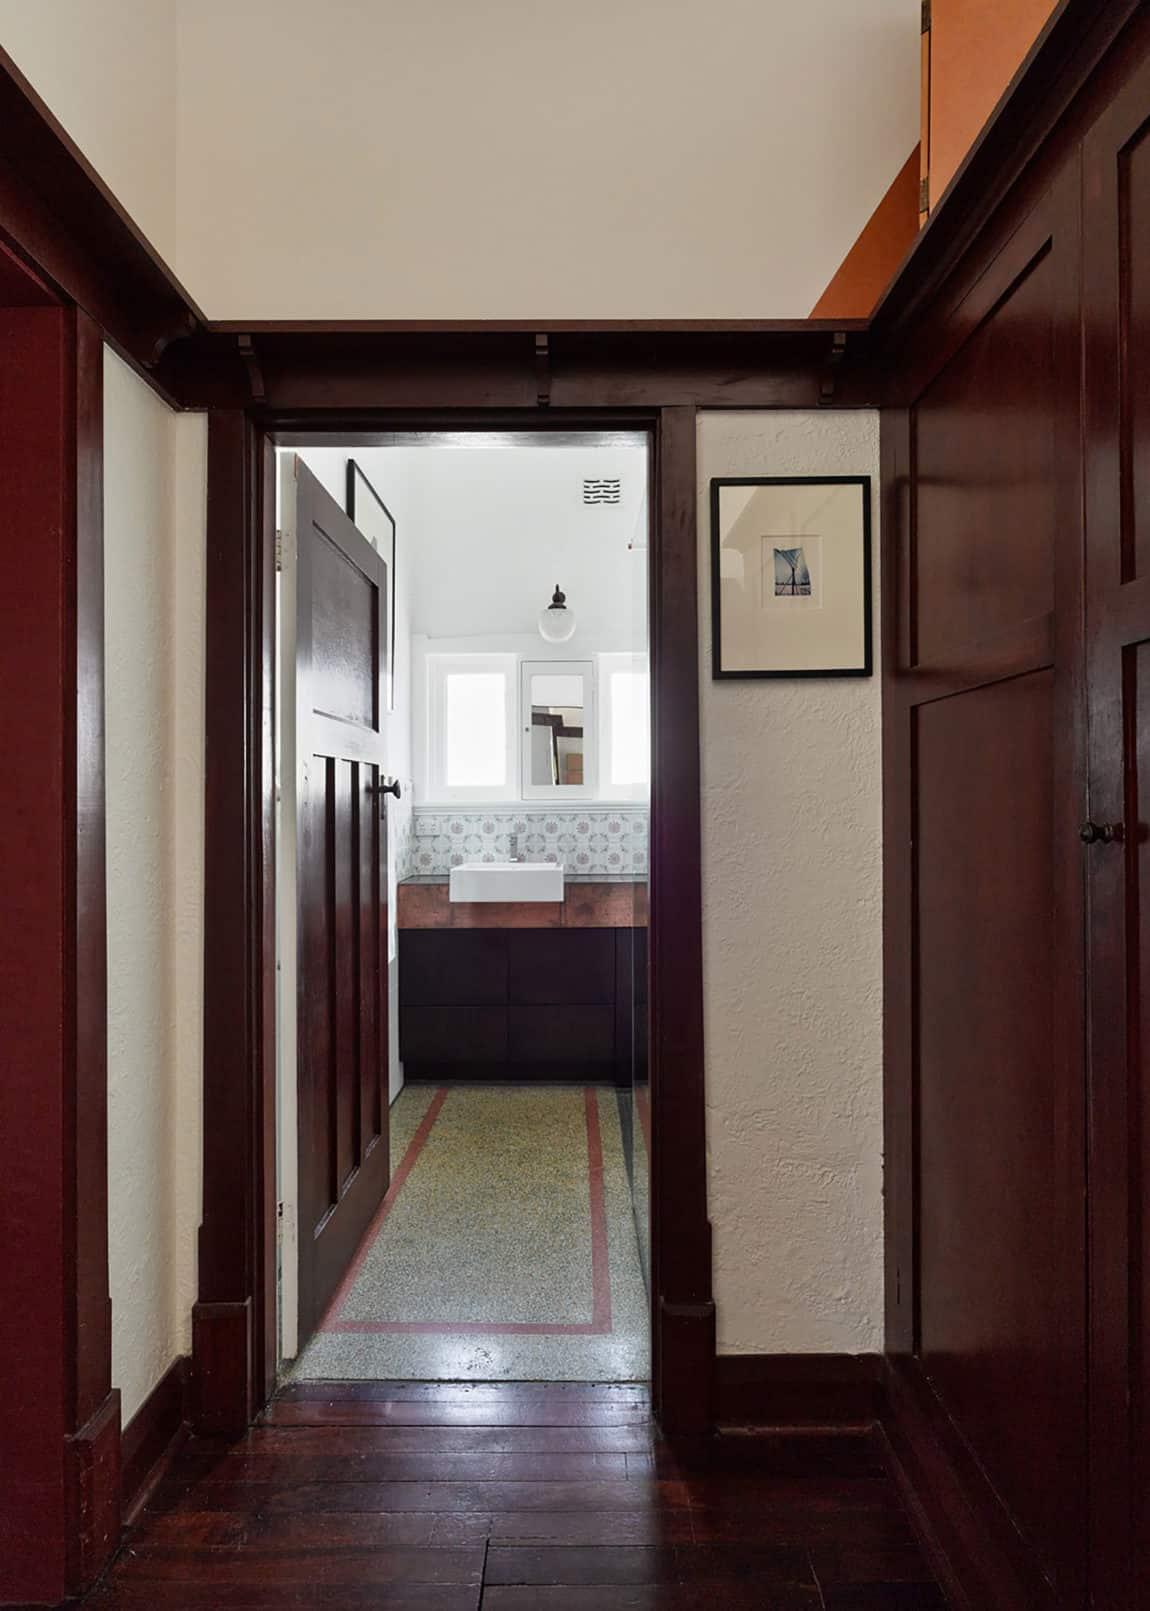 Casa 31_4 Room House by Iredale Pedersen Hook (26)